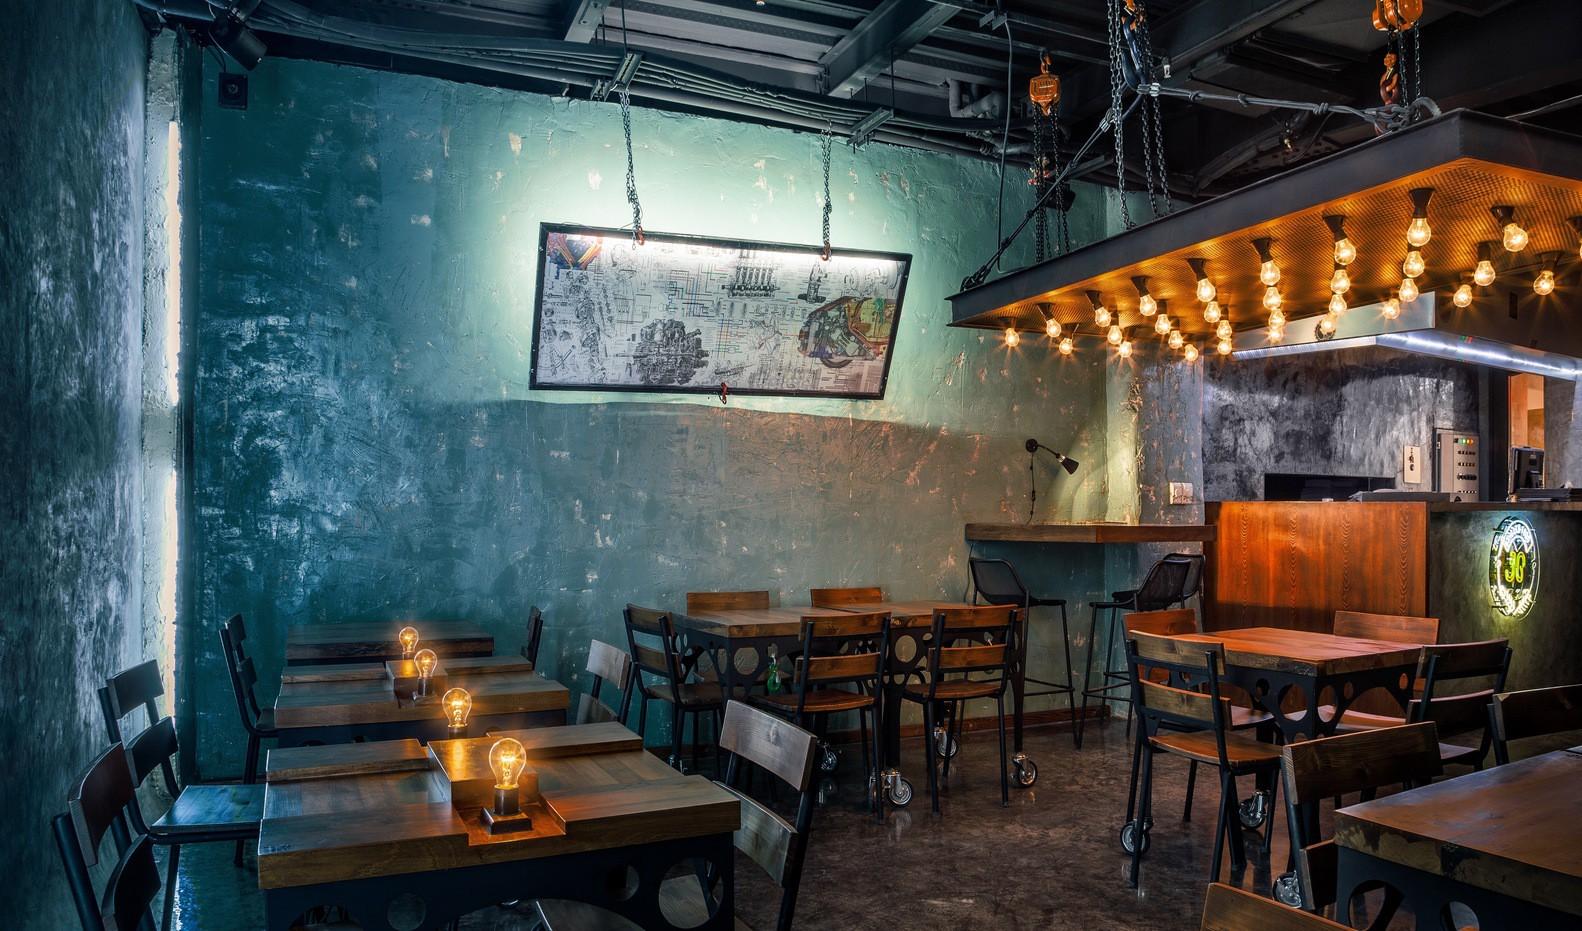 Miglior ristorante in Medio Oriente e Africa: Jo Grilled Food (Teherán, Irán) / WhiteRhino Design Group